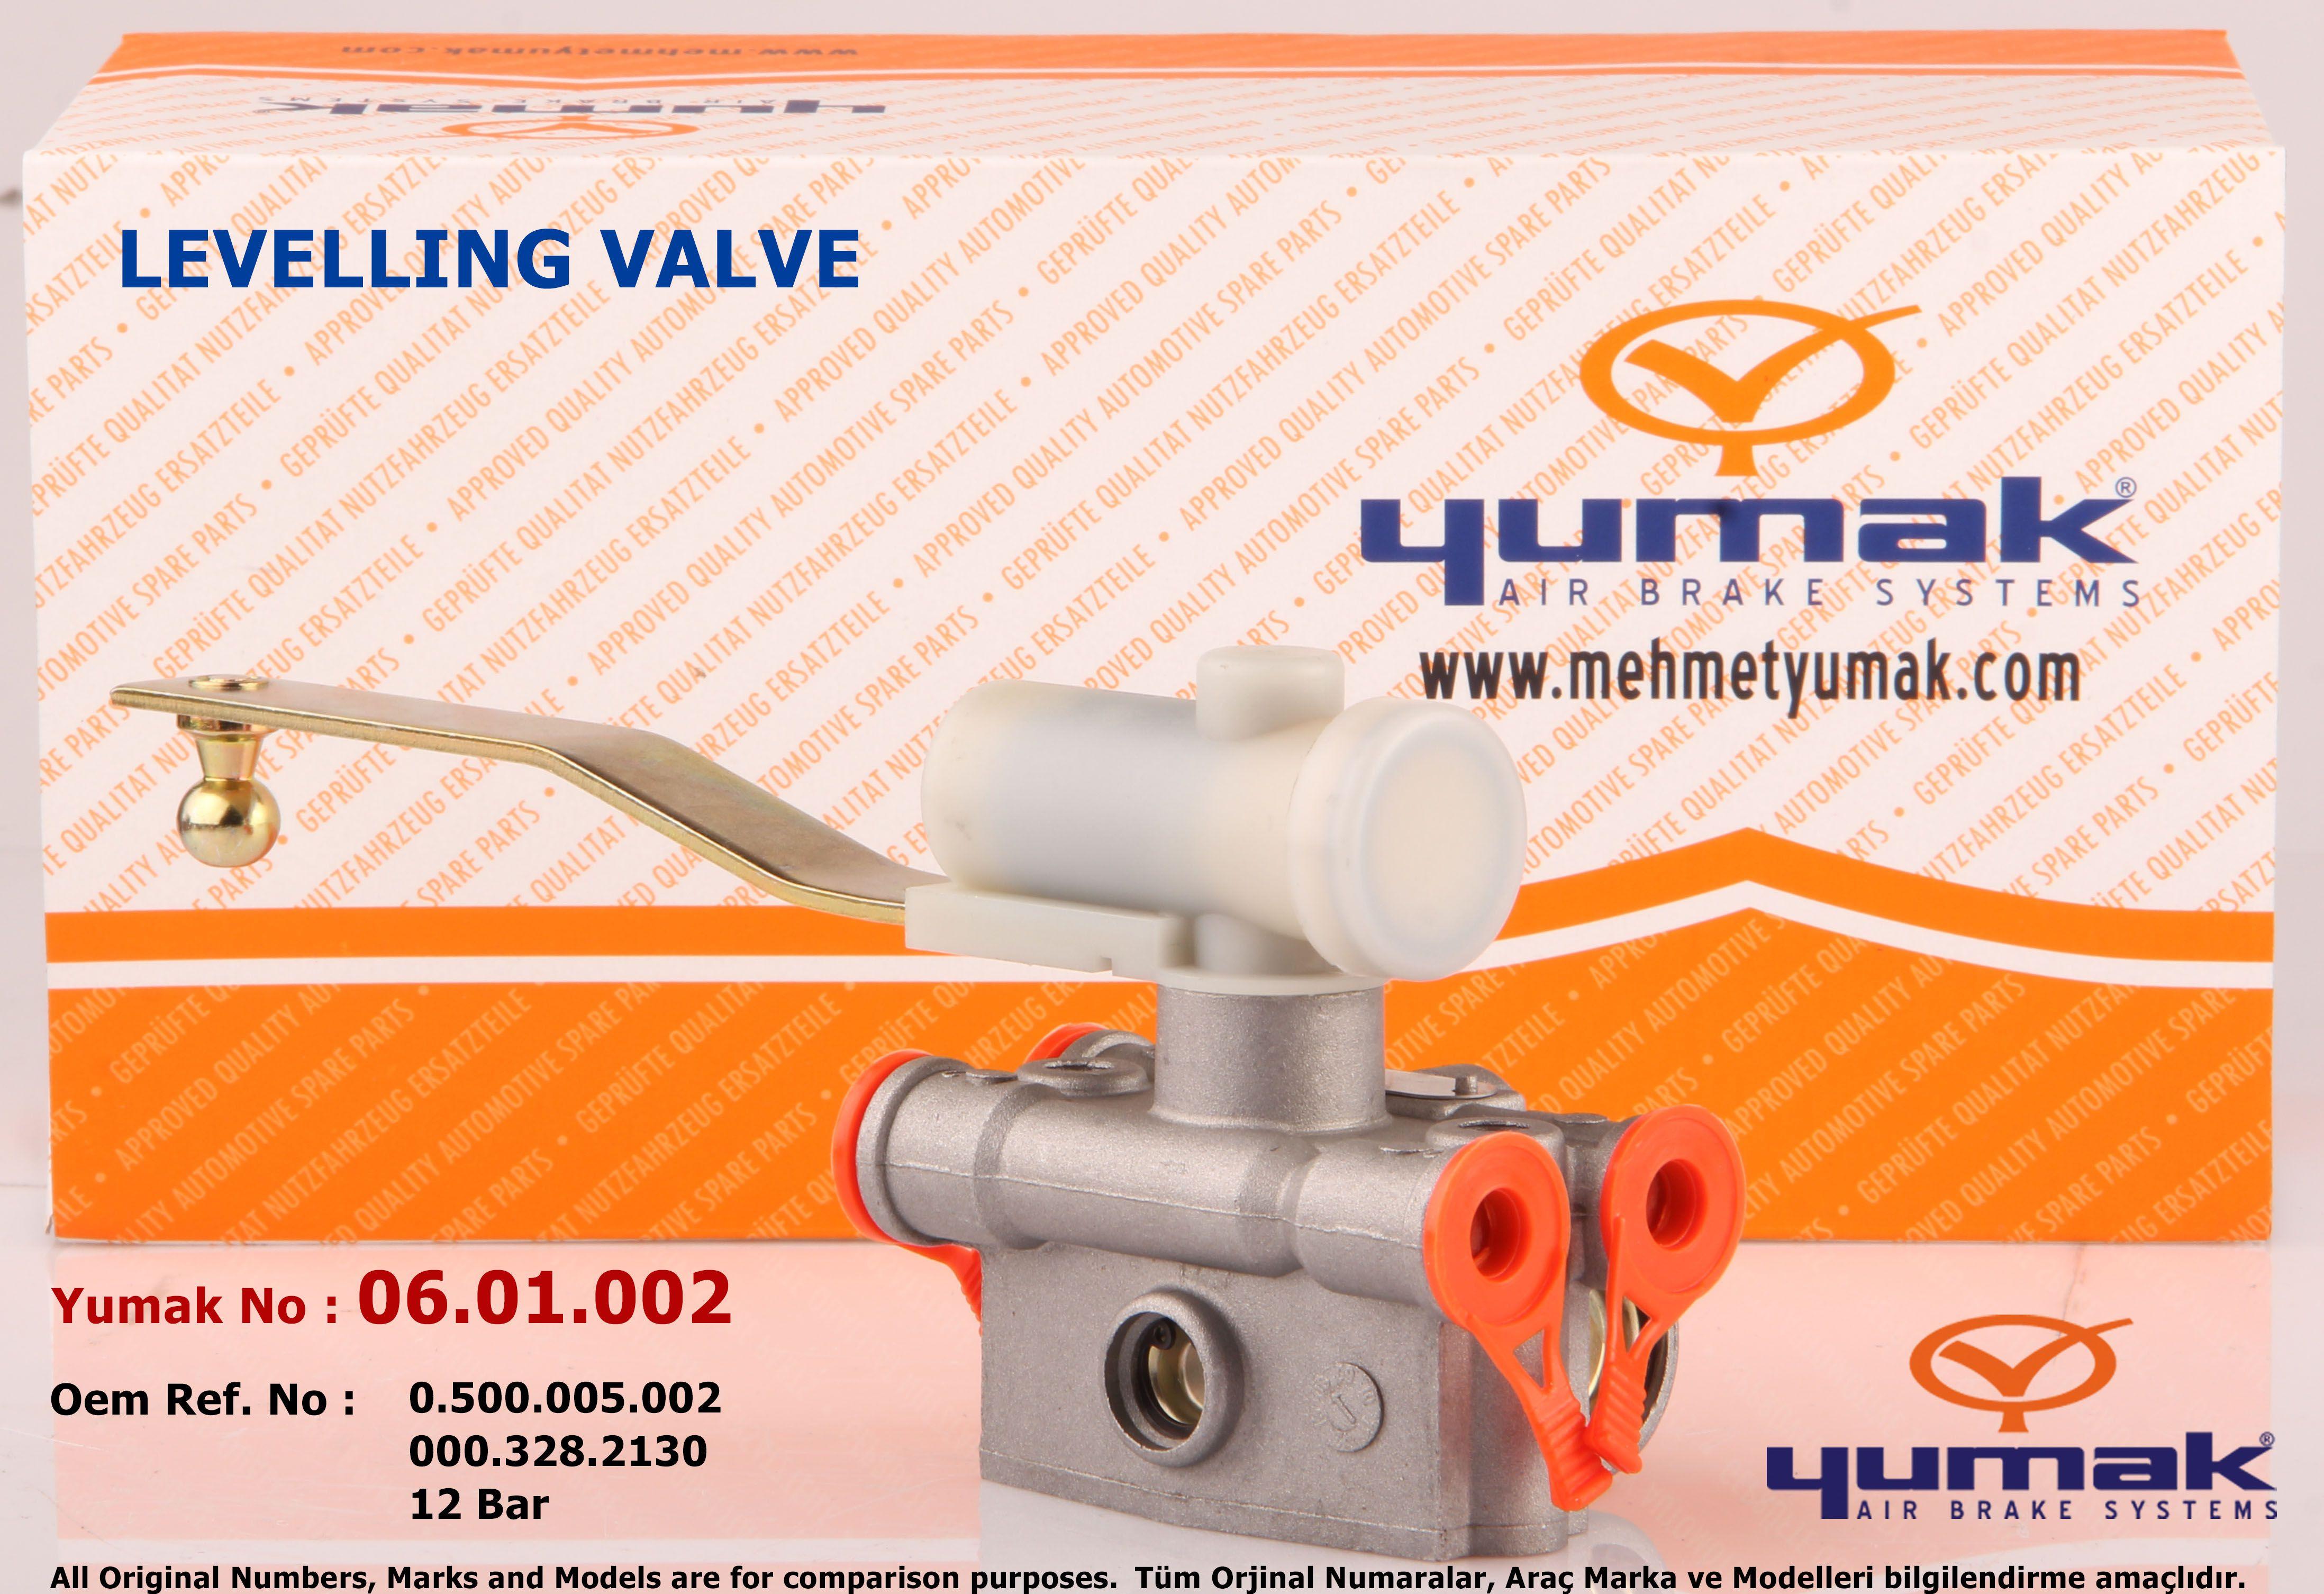 Levelling Valve Yumak No 06.01.002 Oem REf. No 0.500